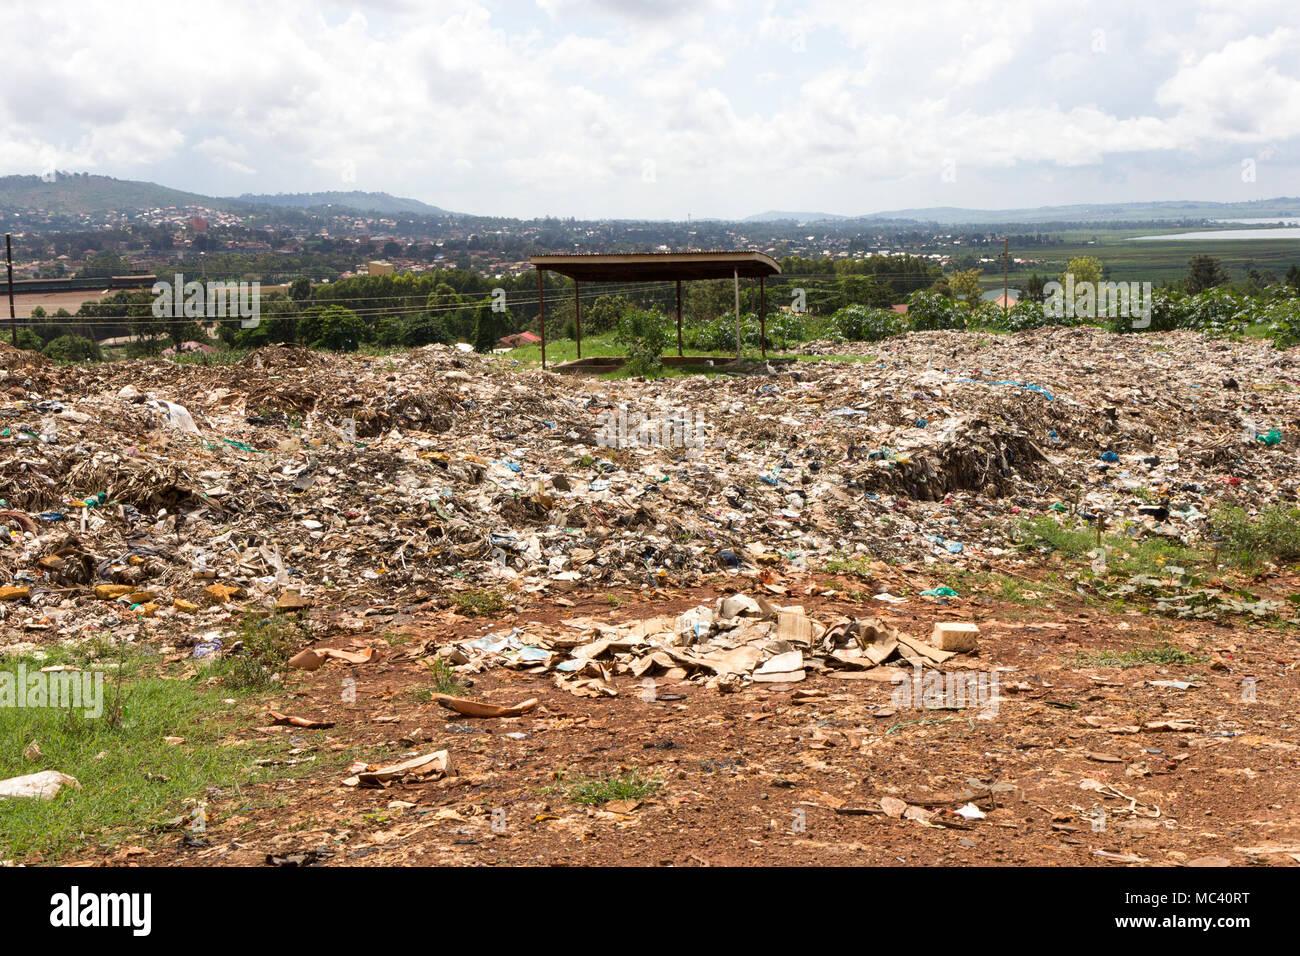 Jinja, Uganda. 21 May 2017. A large landfill of waste sprawling on the suburbs of the Ugandan city of Jinja. - Stock Image